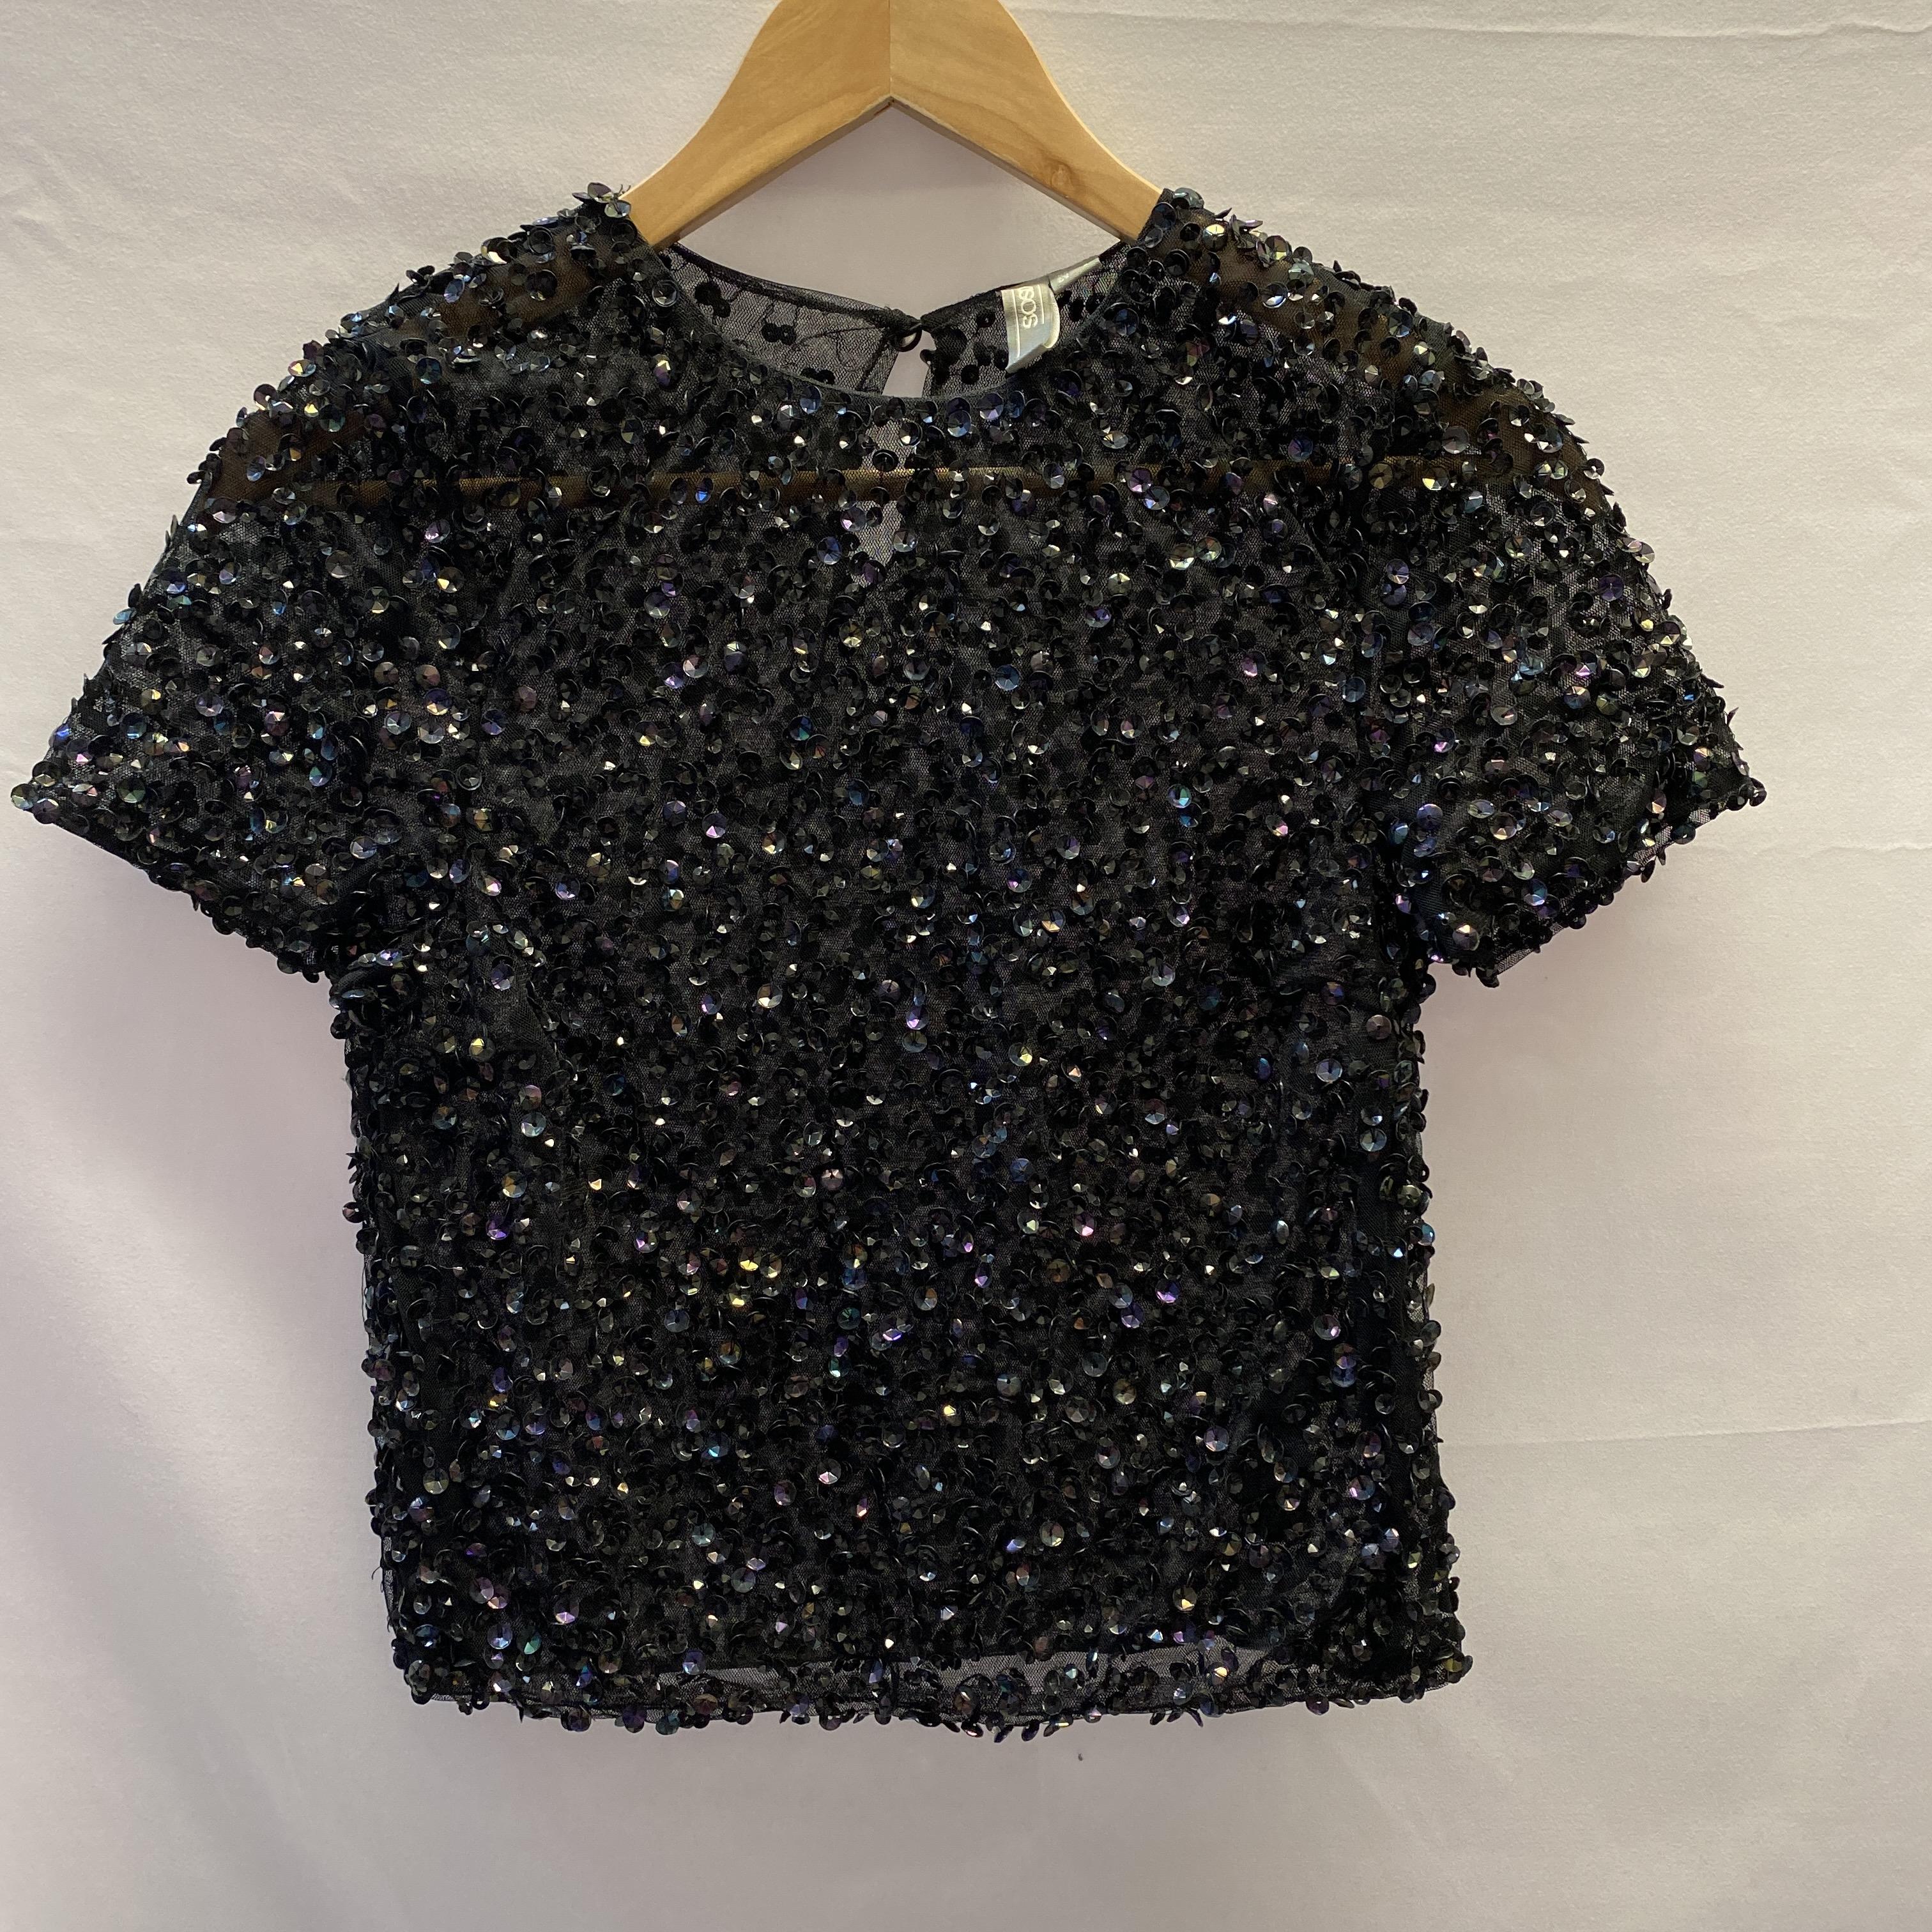 ASOS Size 8 Sequin Top